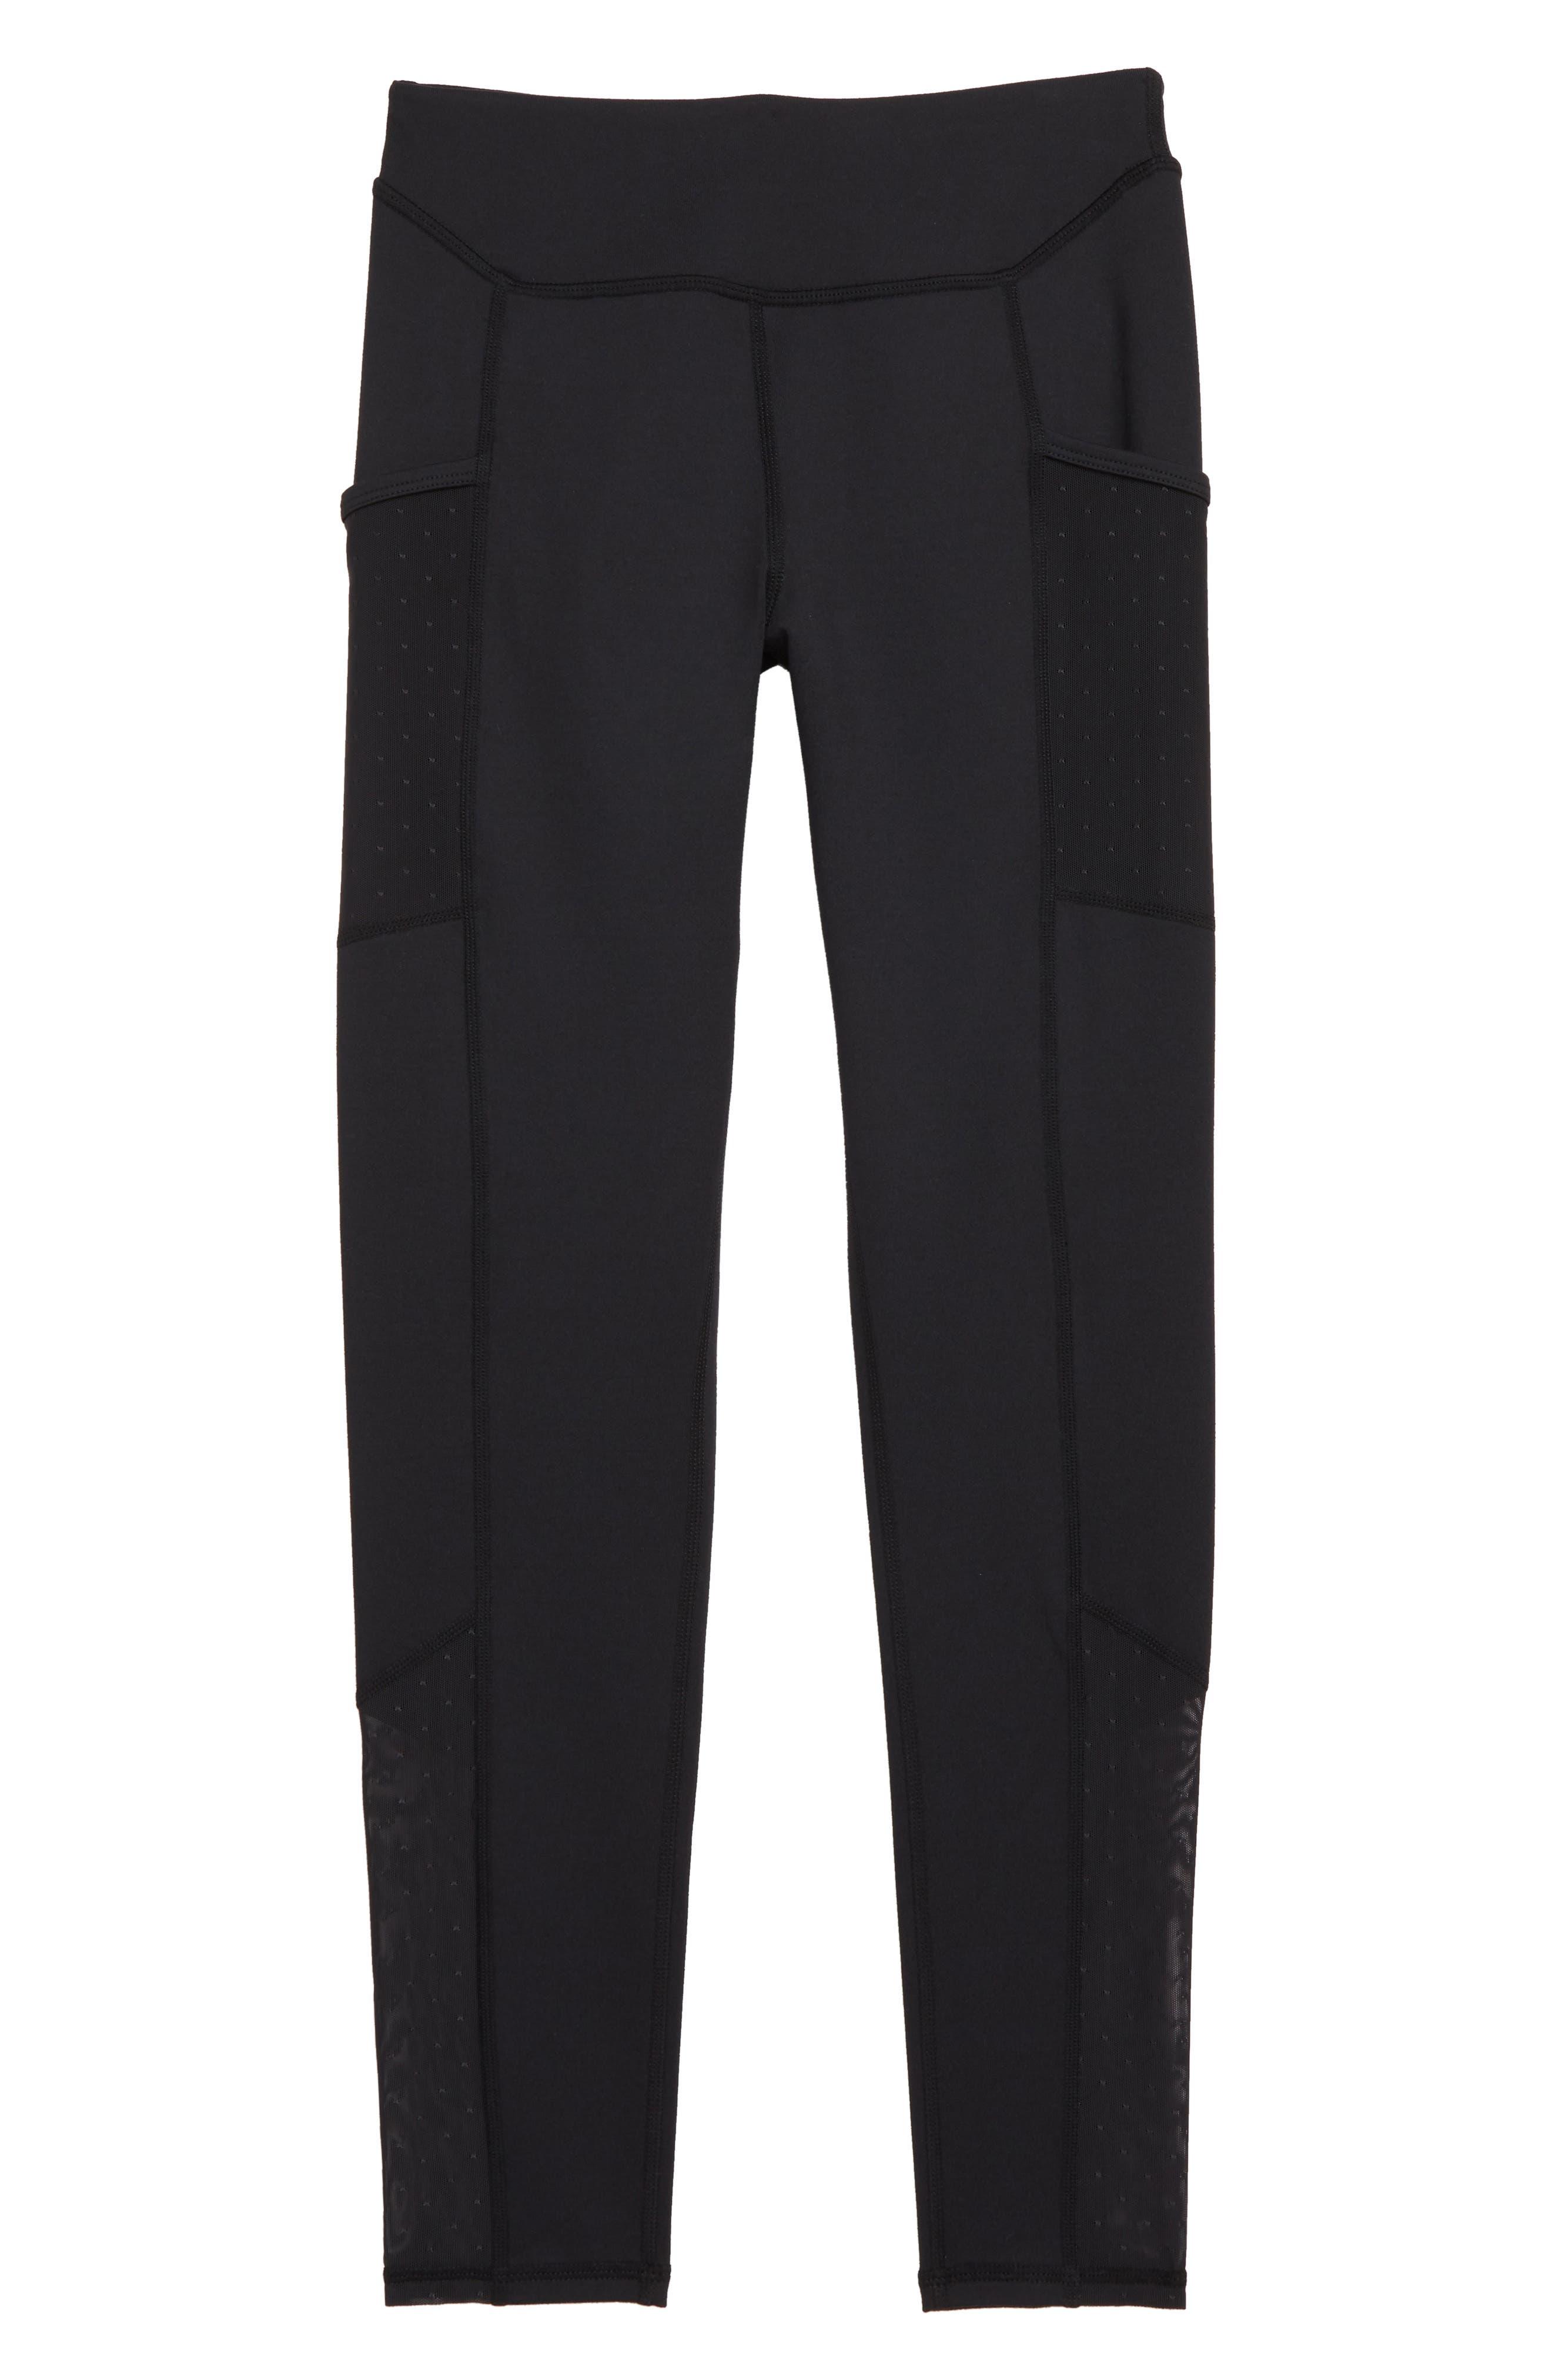 High Waist Mesh Pocket Leggings,                         Main,                         color, BLACK